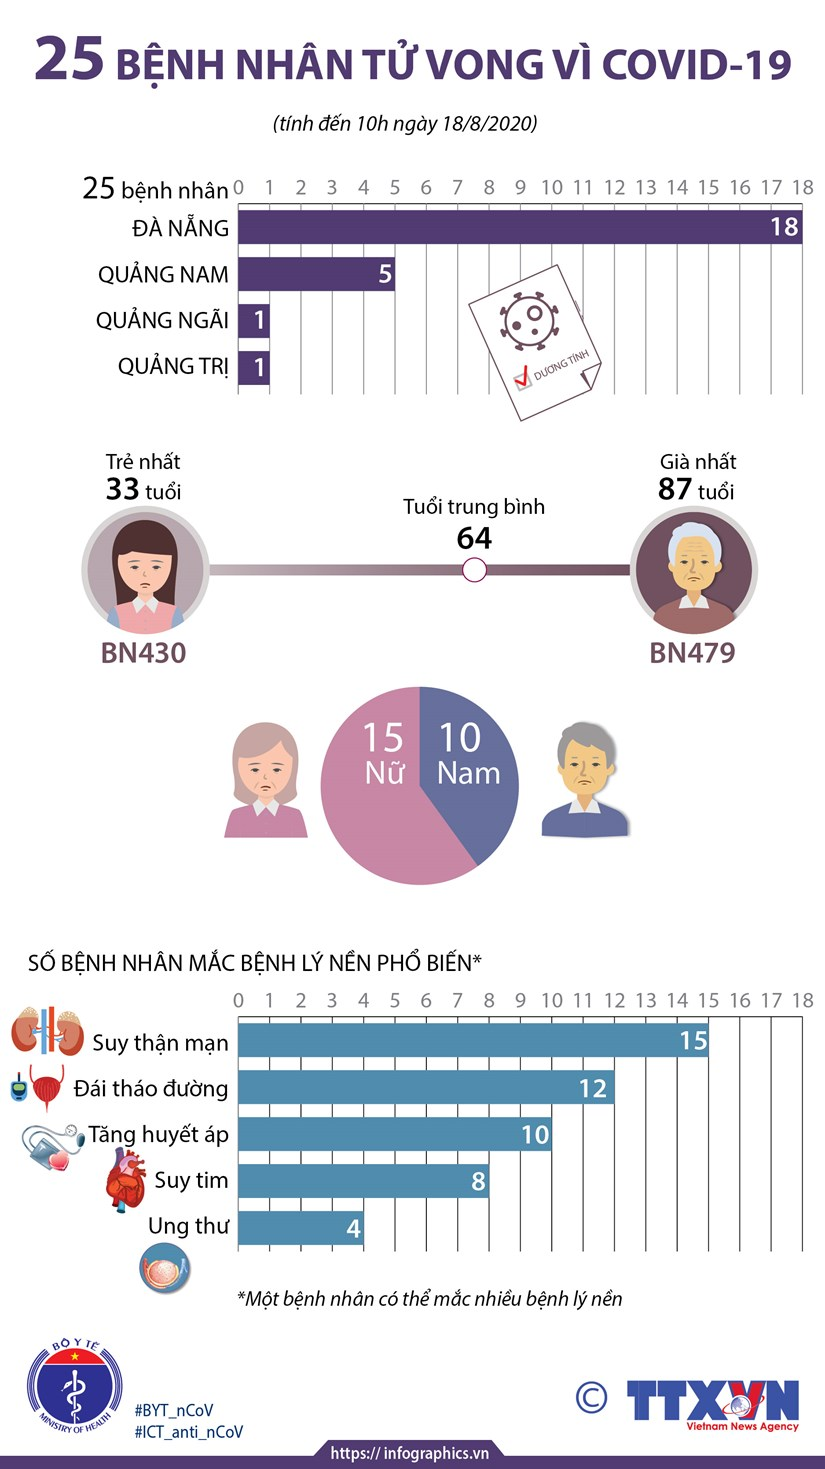 [Infographics] Viet Nam da co 25 benh nhan tu vong vi COVID-19 hinh anh 1